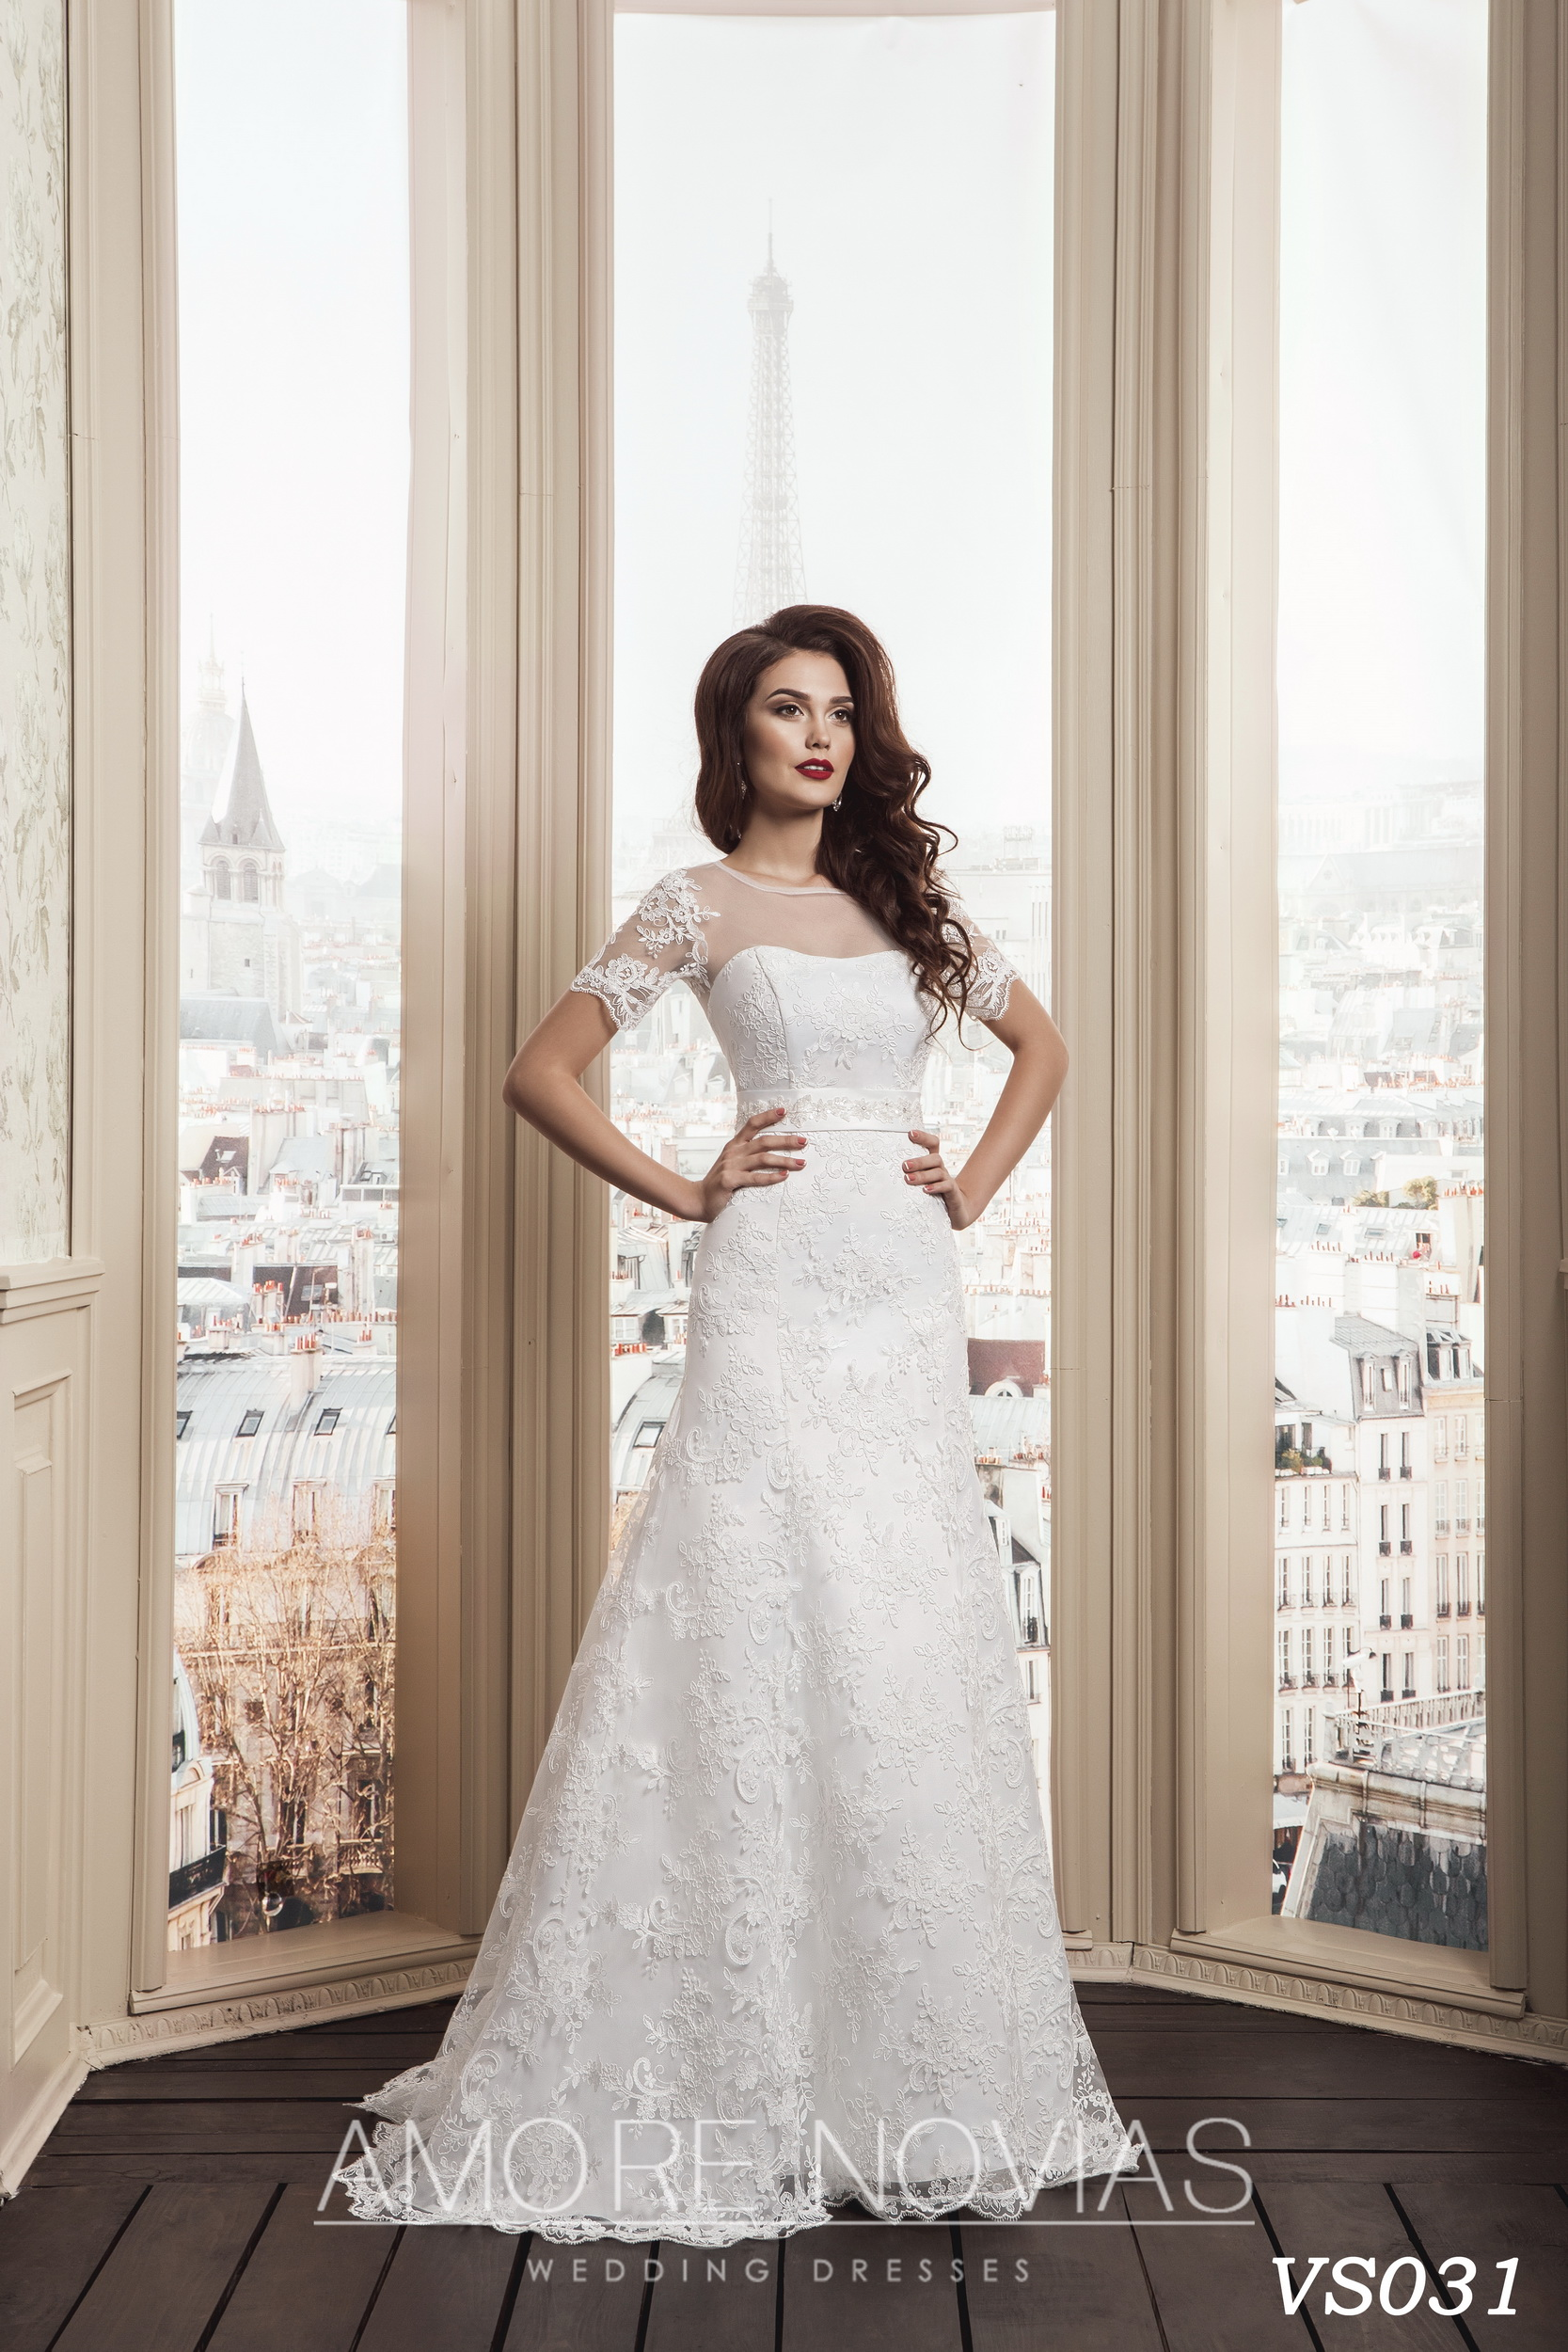 http://amore-novias.com/images/stories/virtuemart/product/vs031.jpg